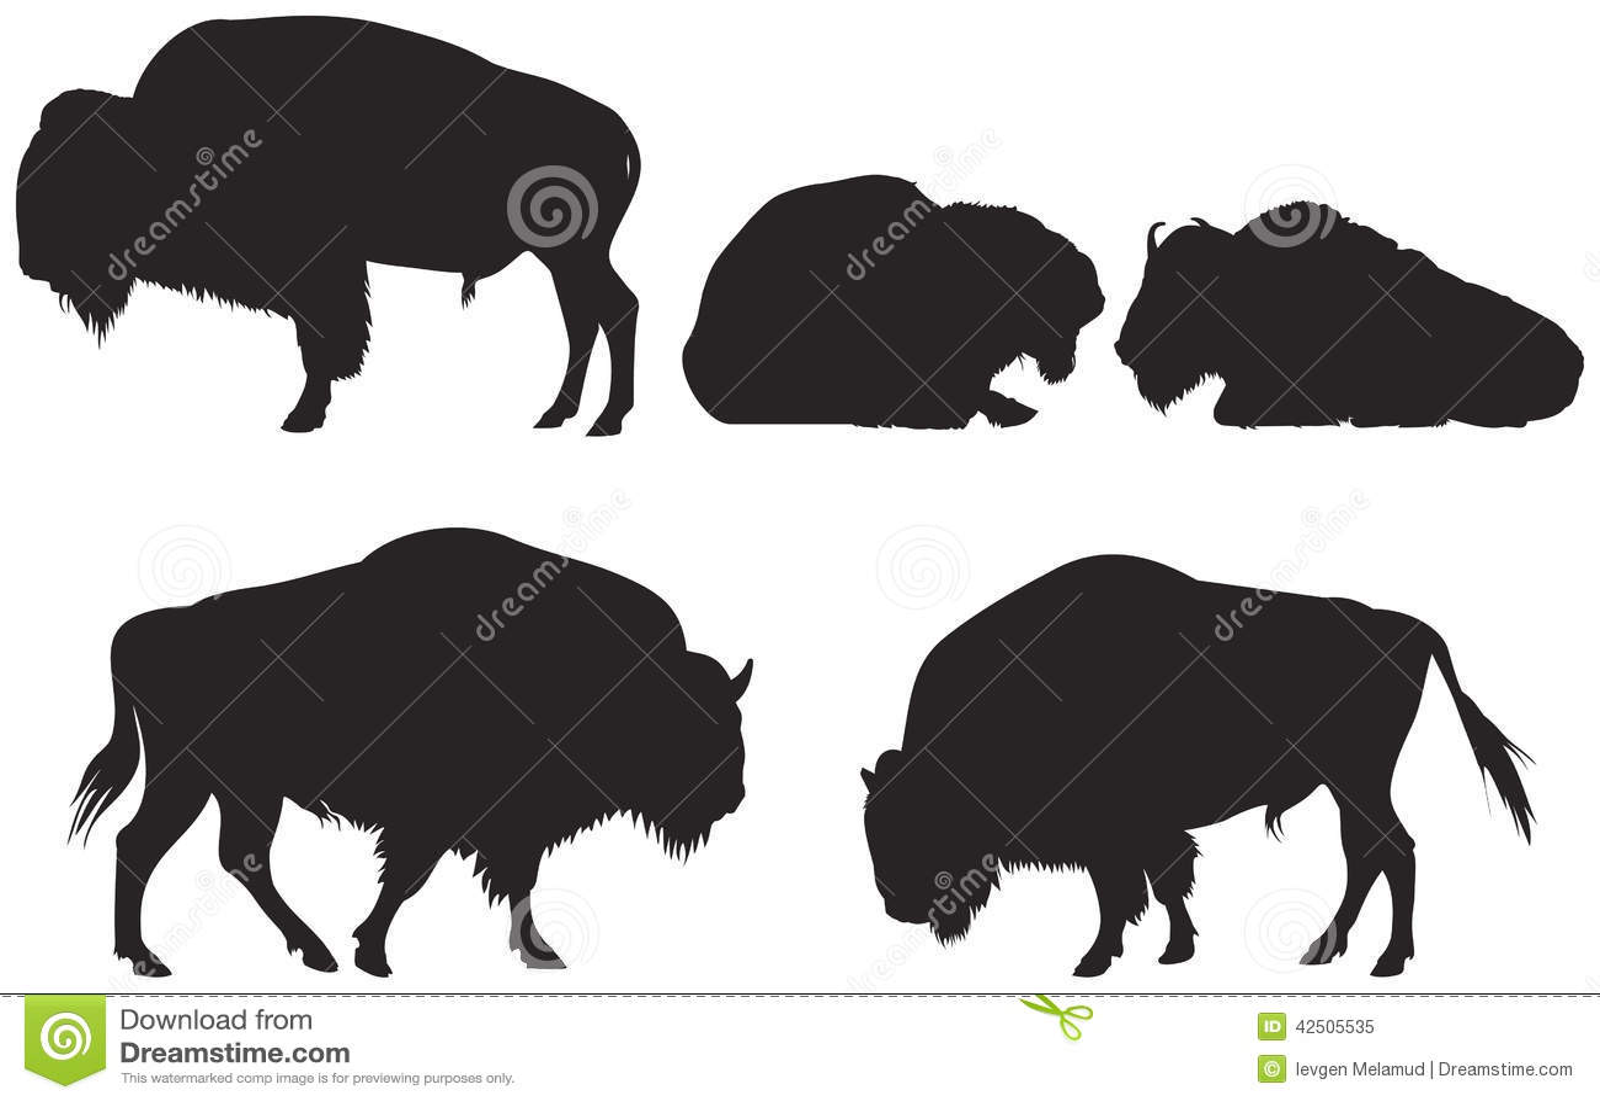 Bisonte ou búfalo